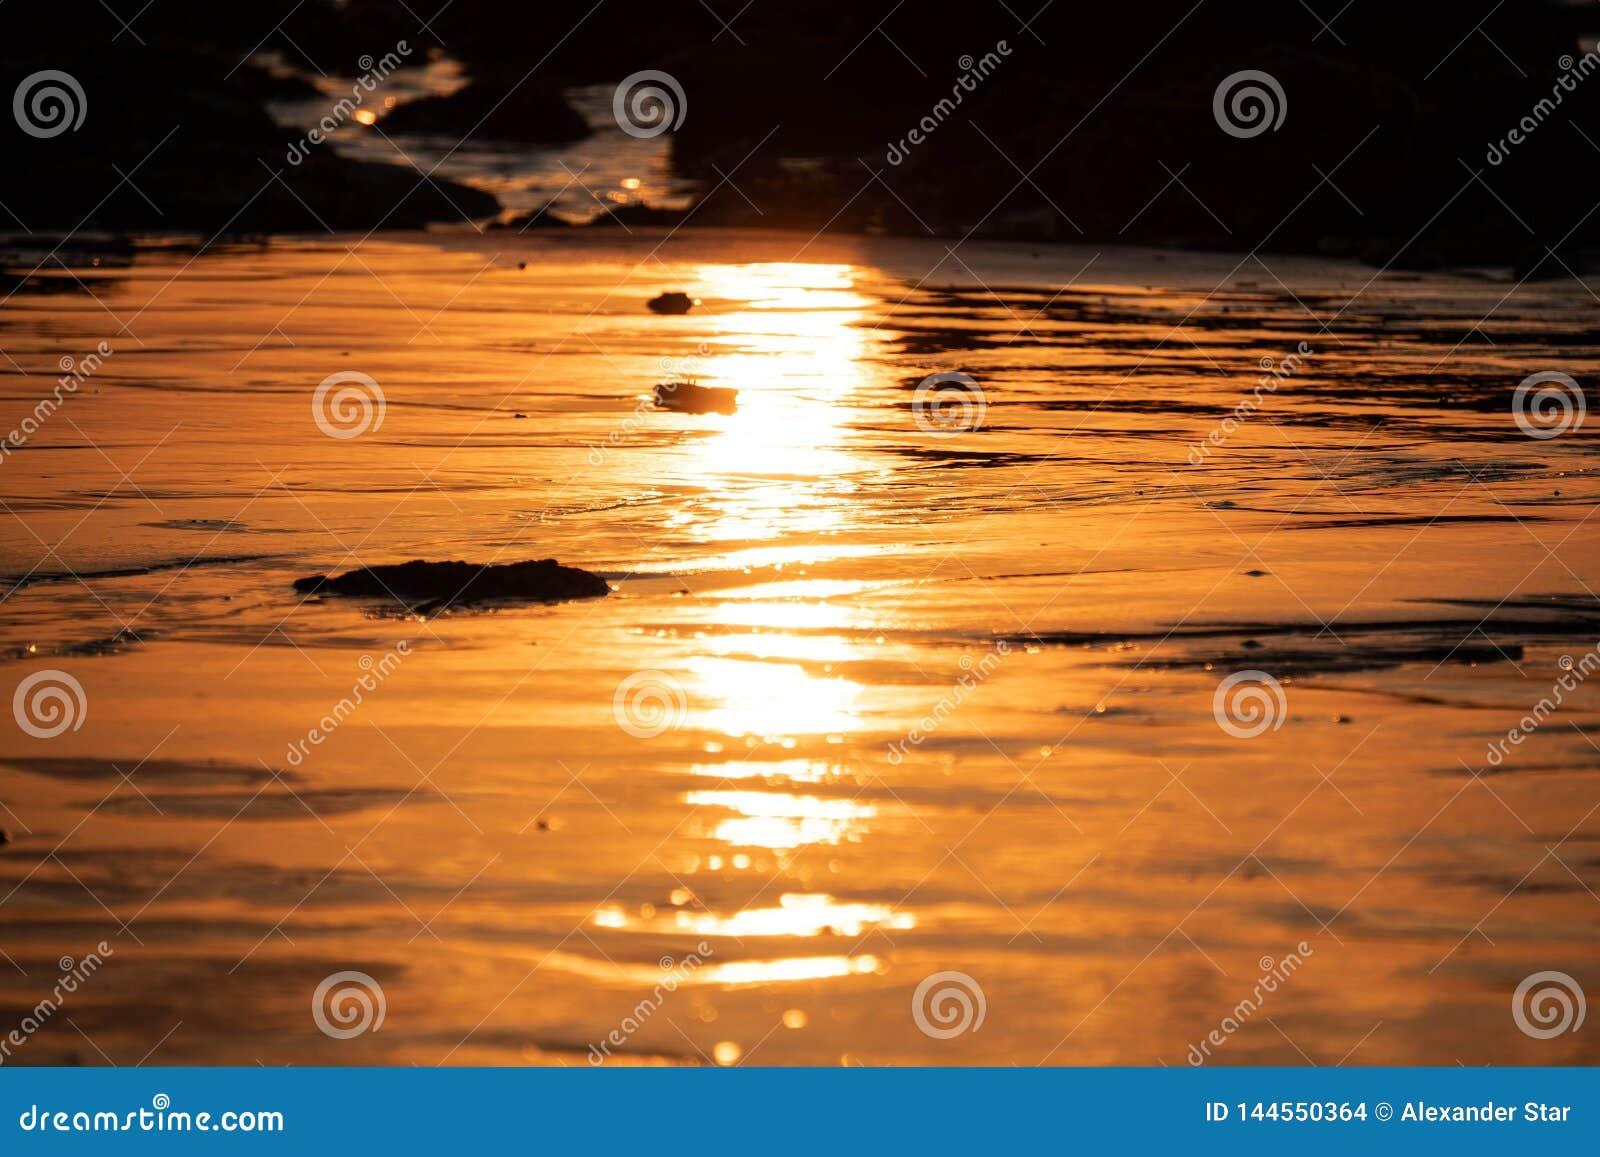 De Zonsondergangbezinning van Thailand over het strand